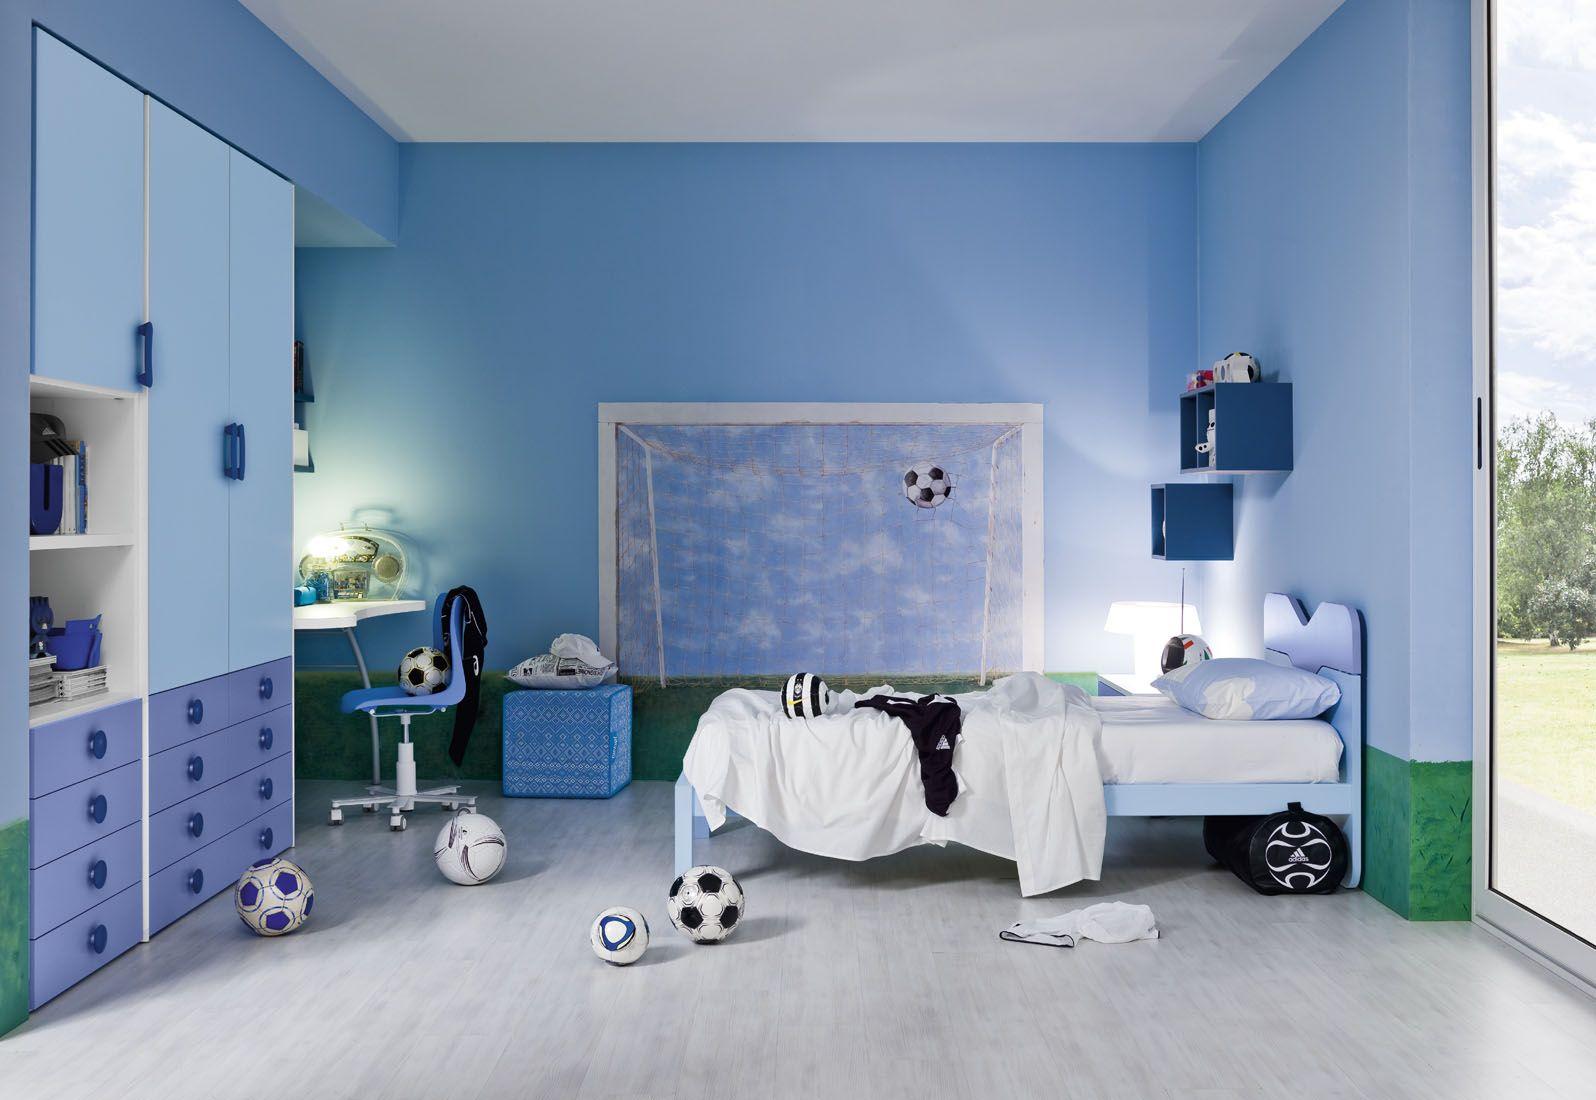 Boys soccer bedroom ideas - 1000 Images About Soccer Bedroom On Pinterest Soccer Themed